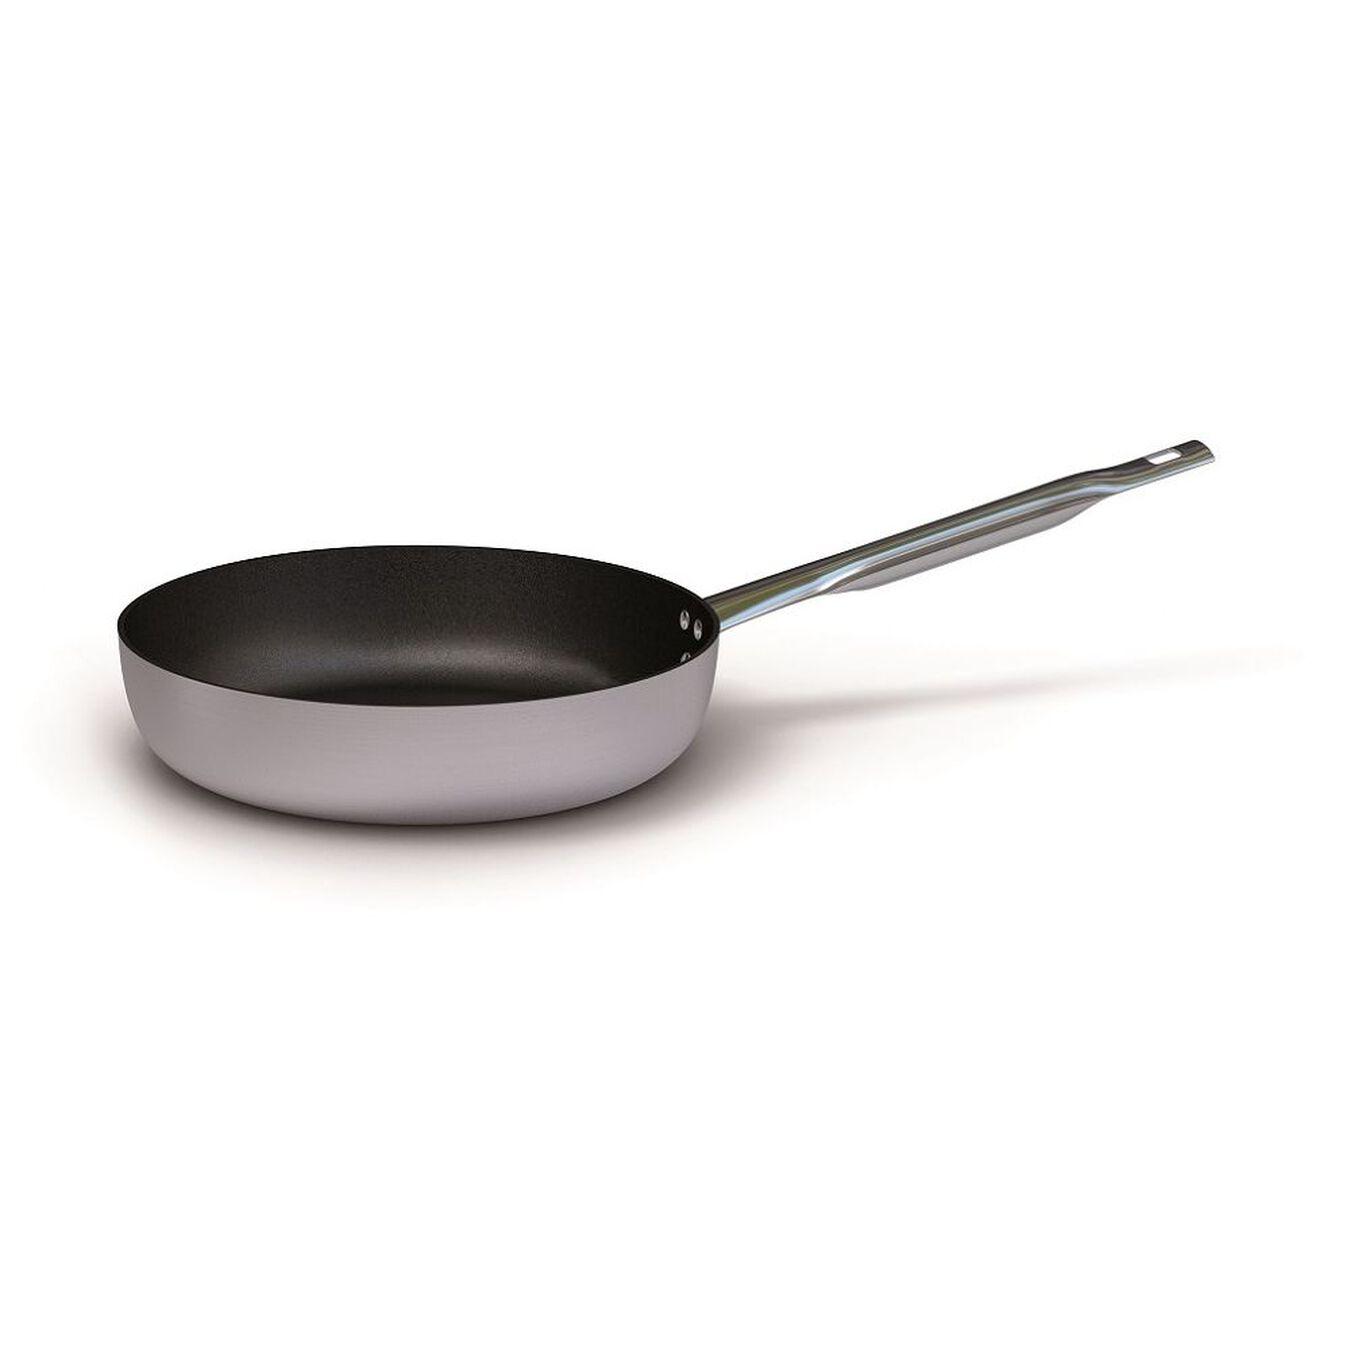 32 cm / 12.5 inch Frying pan,,large 1